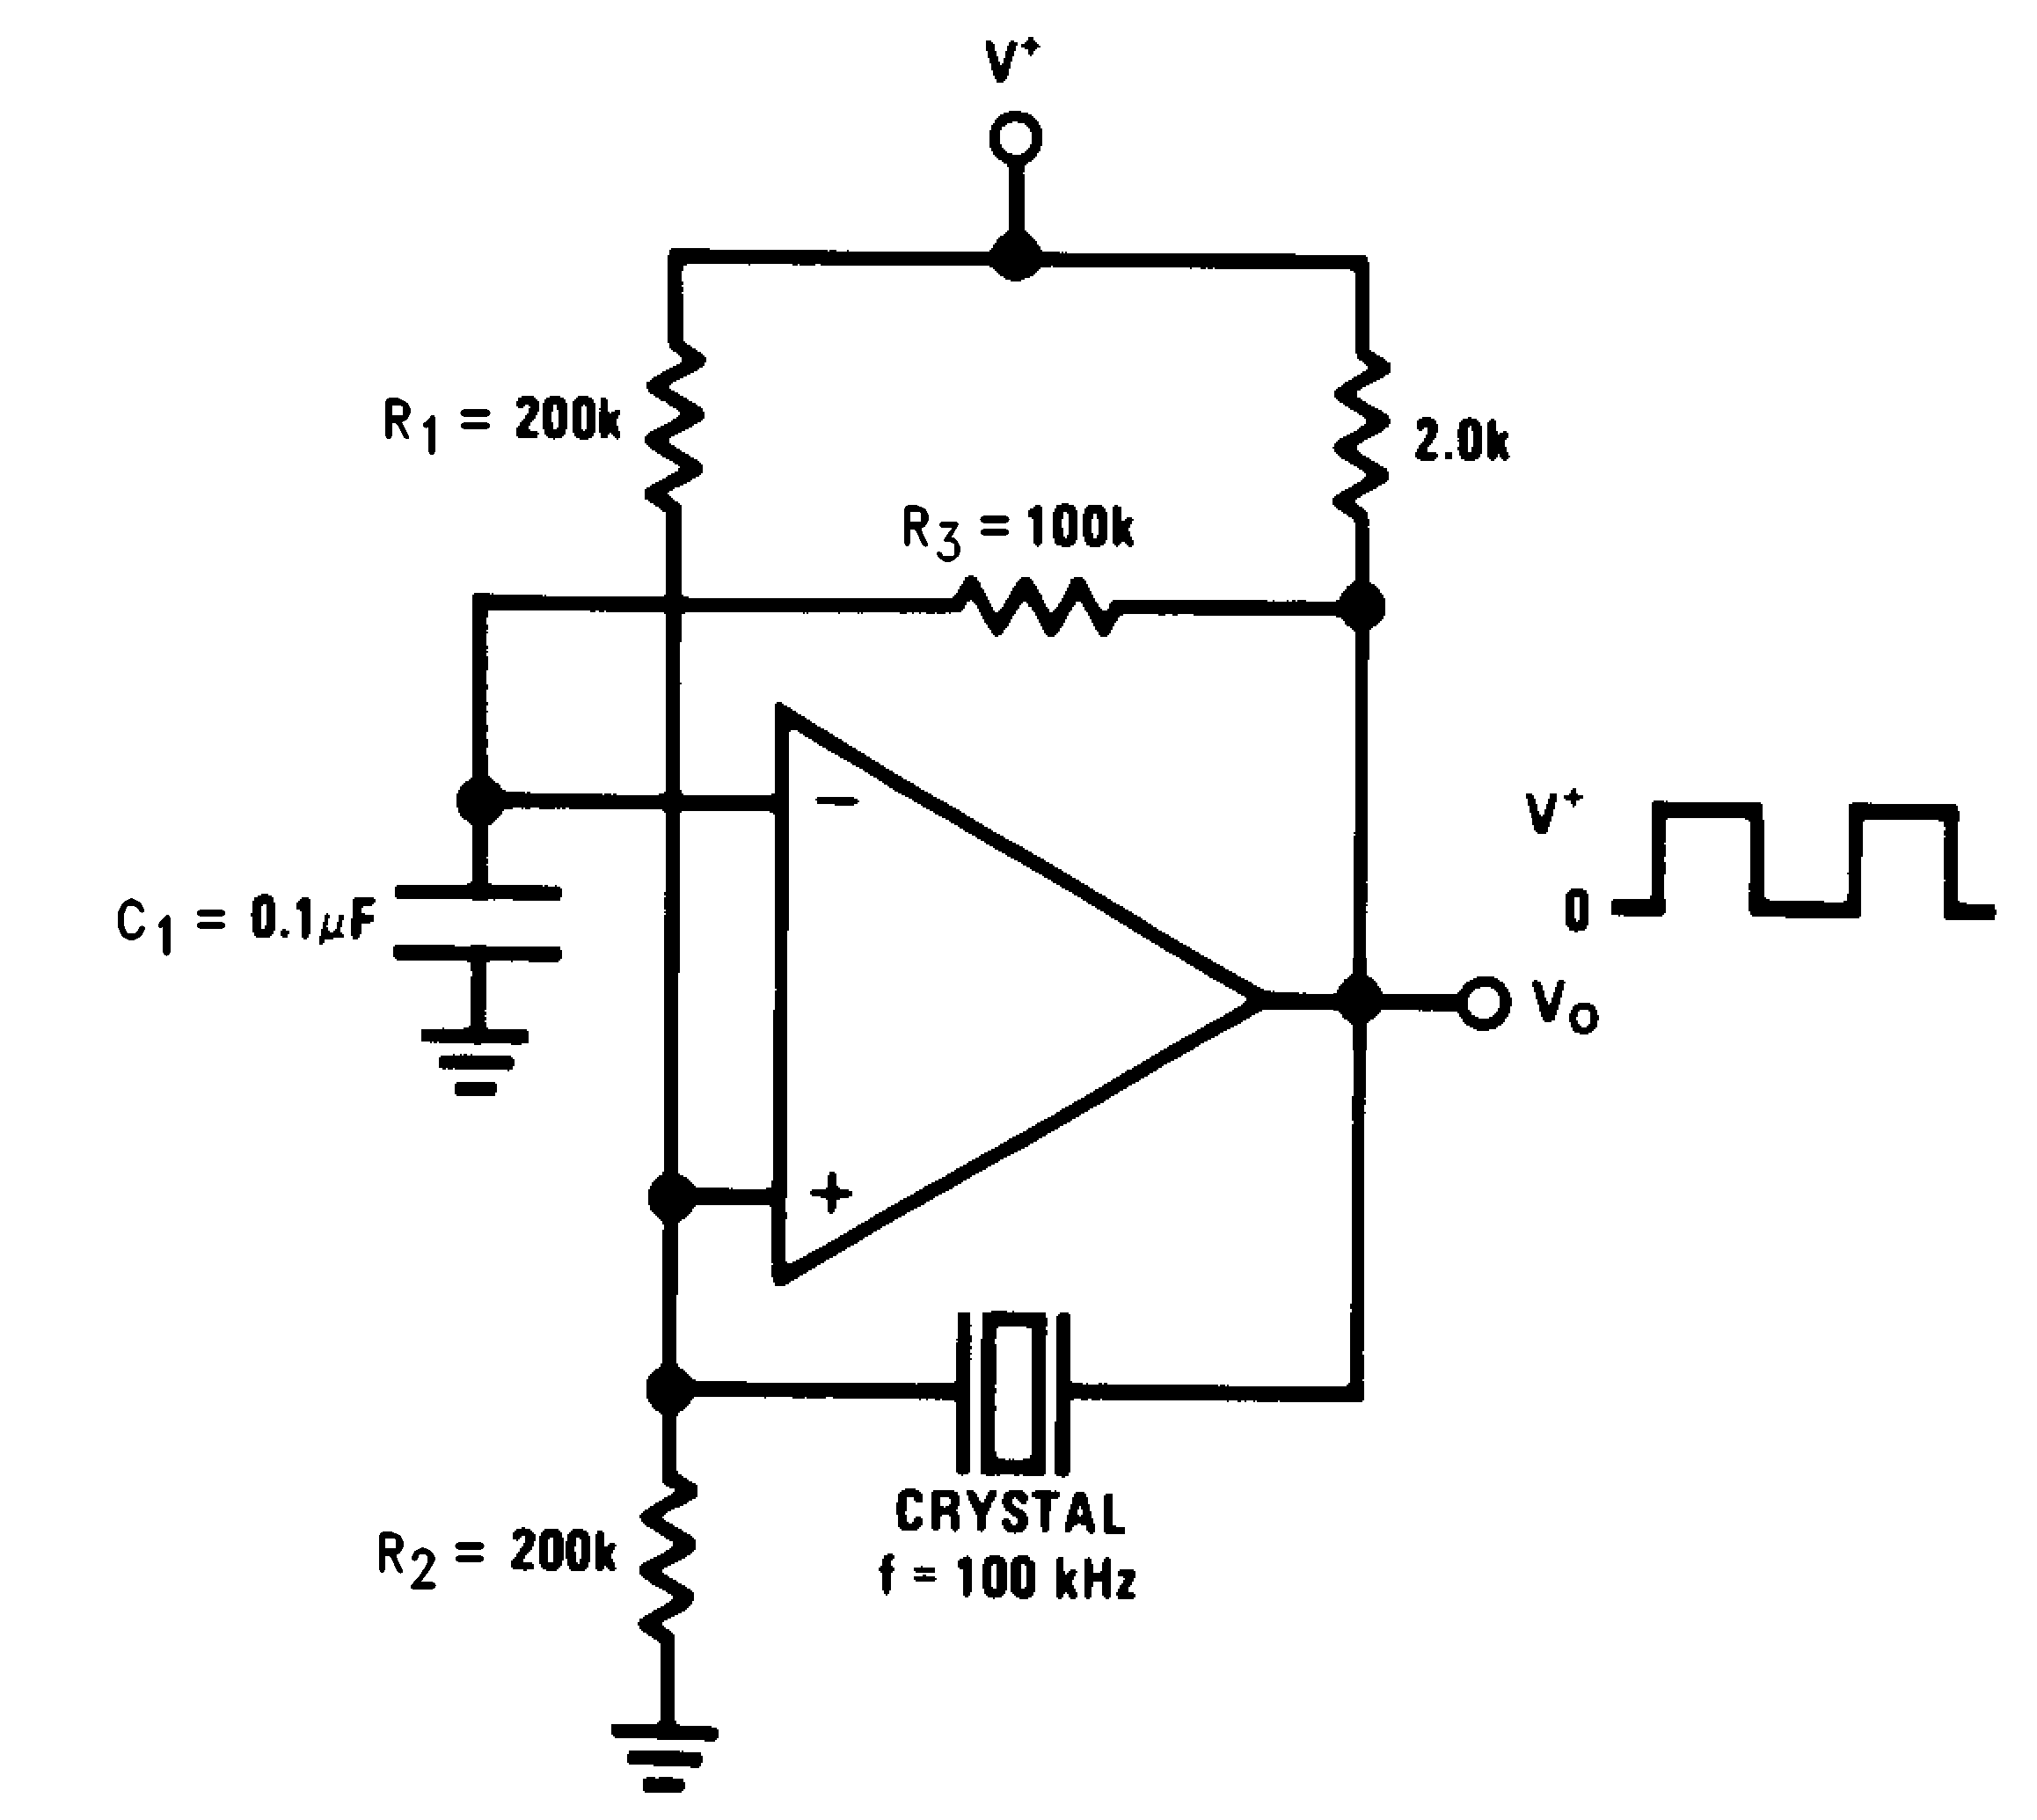 Lmv393 N Adjustabledutycycle Squarewave Oscillator Circuit Diagram Crystal Controlled